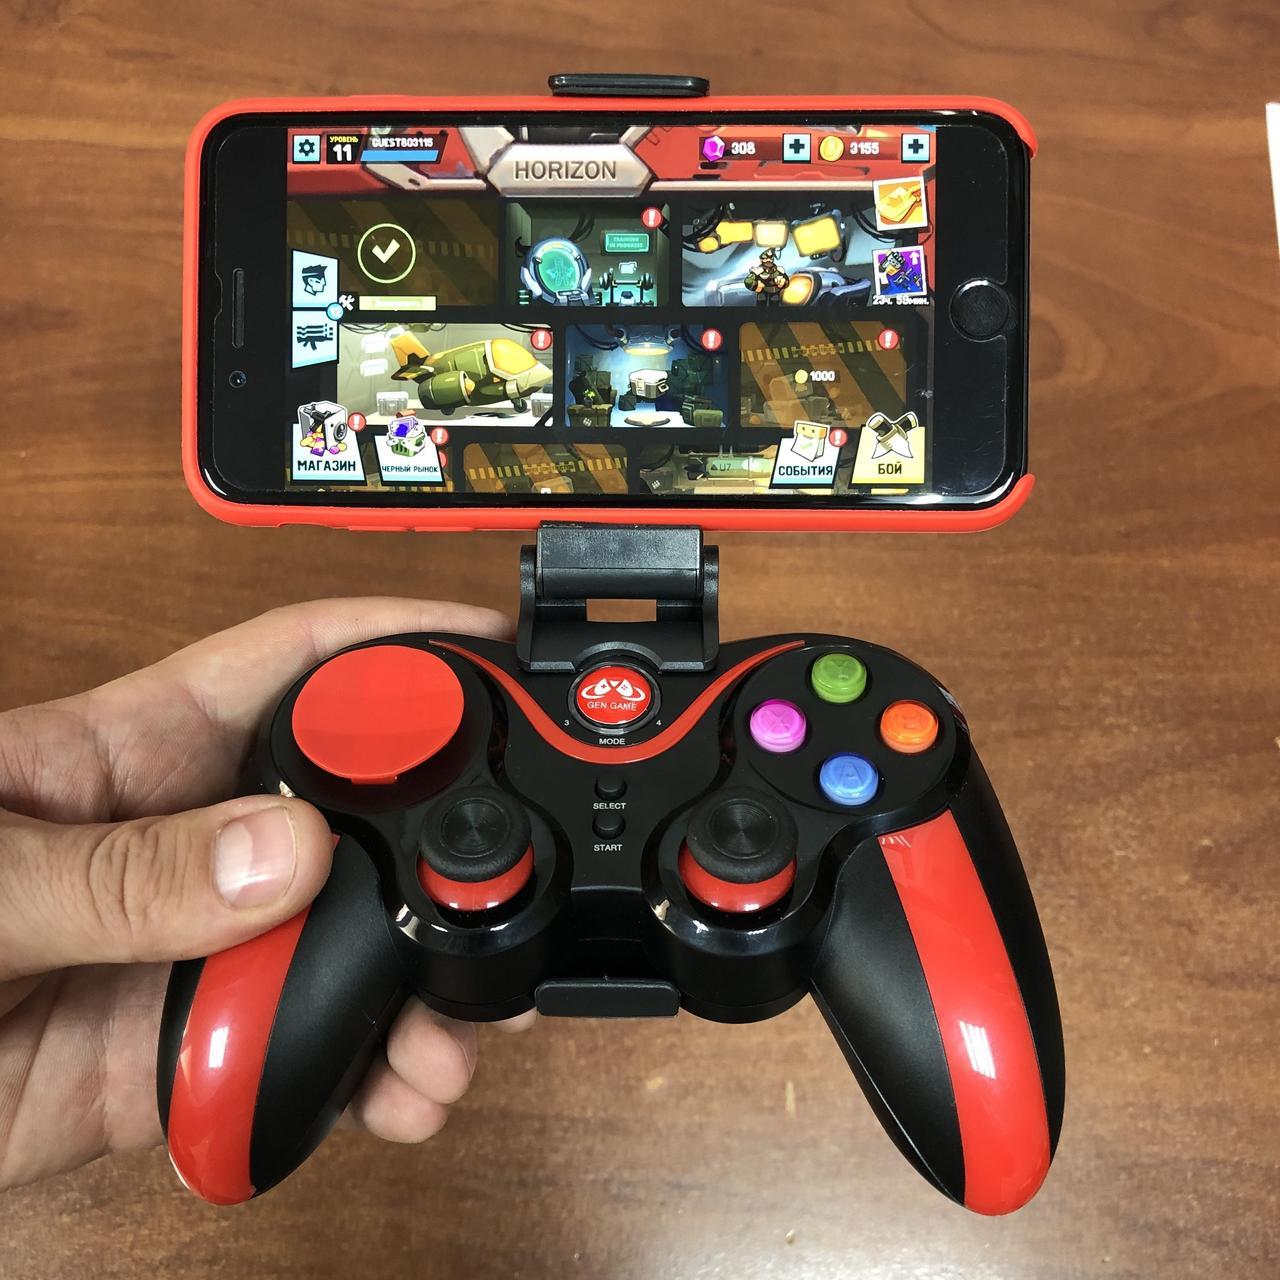 Джойстик S5 Plus беспроводной геймпад bluetooth для IOS,Android, PC gamepad телефона планшета Пк